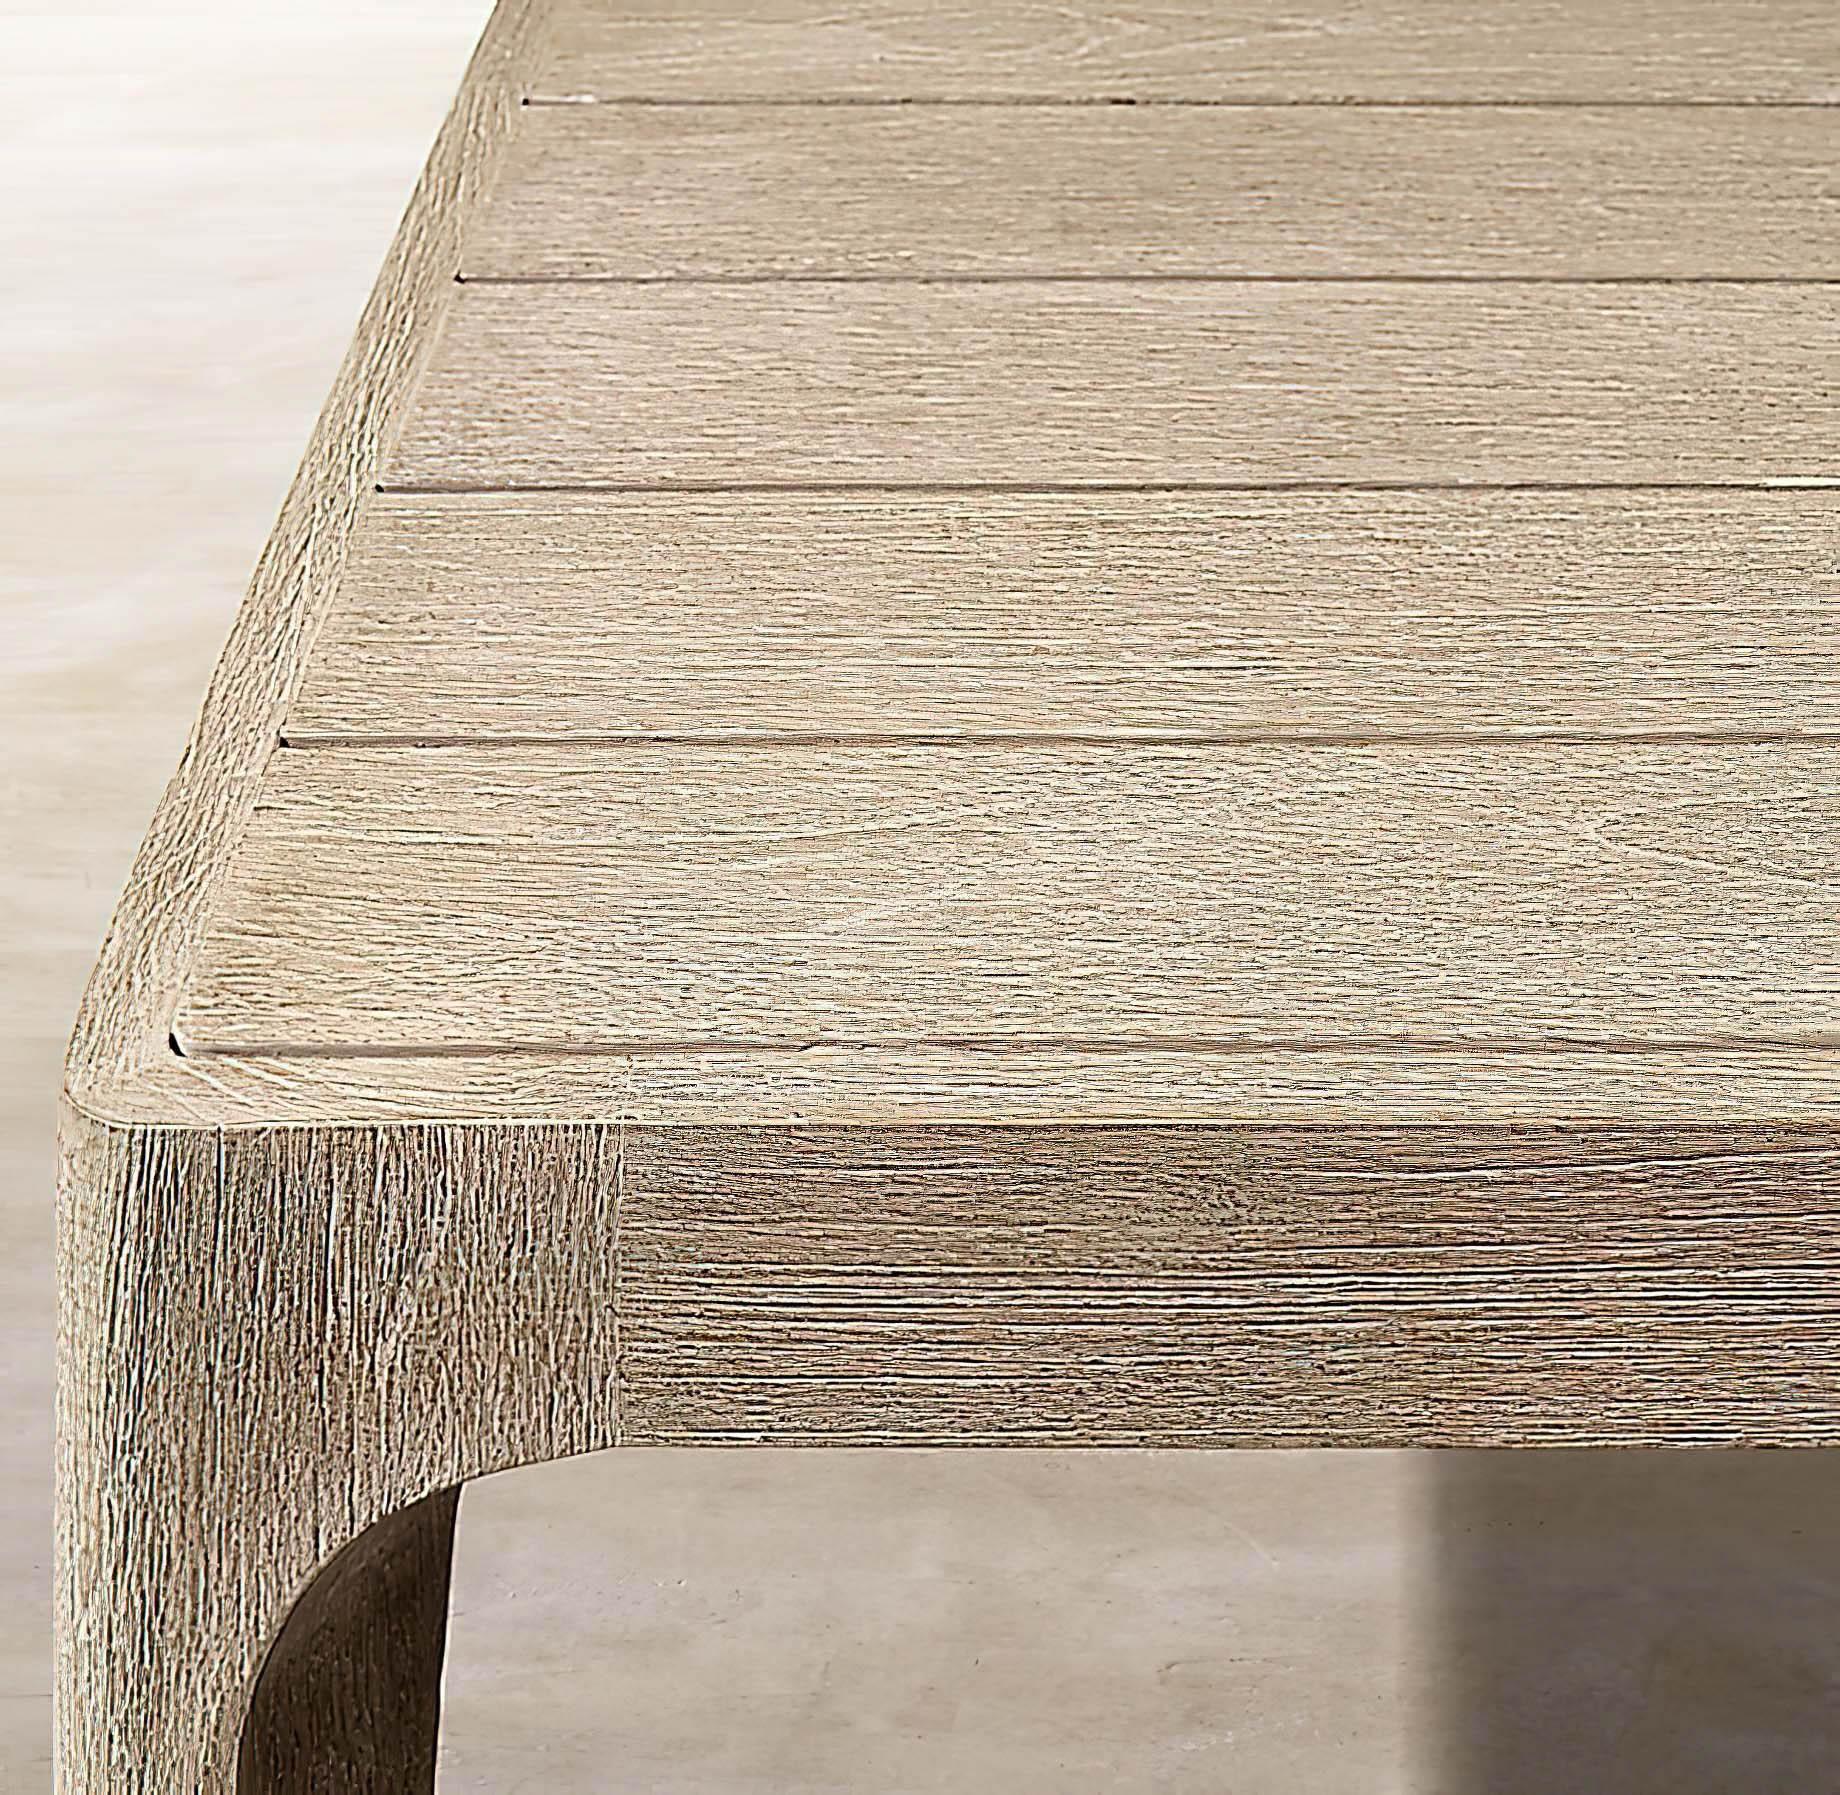 Malta Teak Collection Outdoor Furniture Design for RH – Ramon Esteve – Malta Teak Side Table